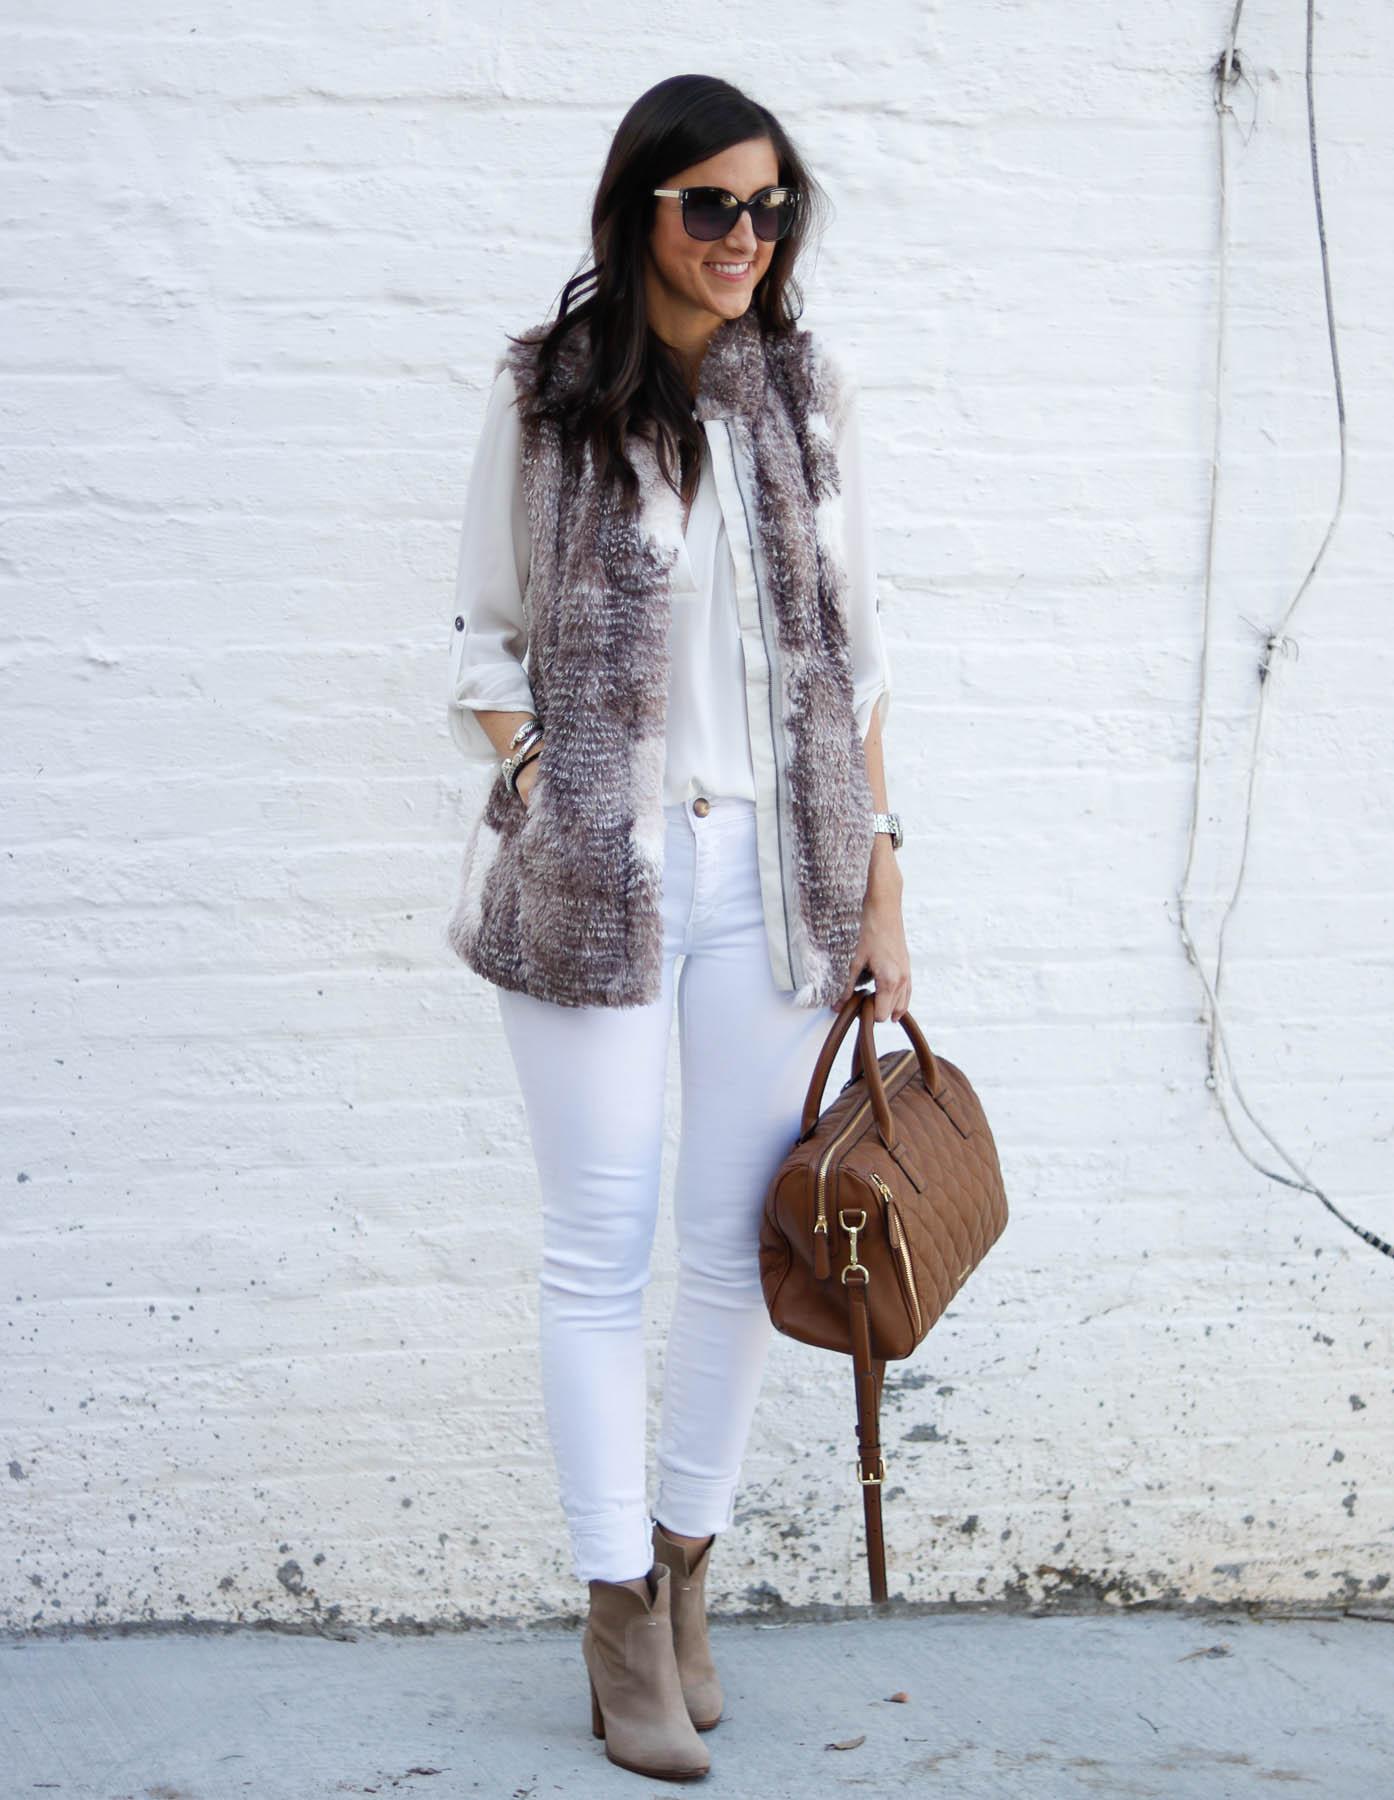 Fall Neutrals + The Perfect Faux Fur Vest